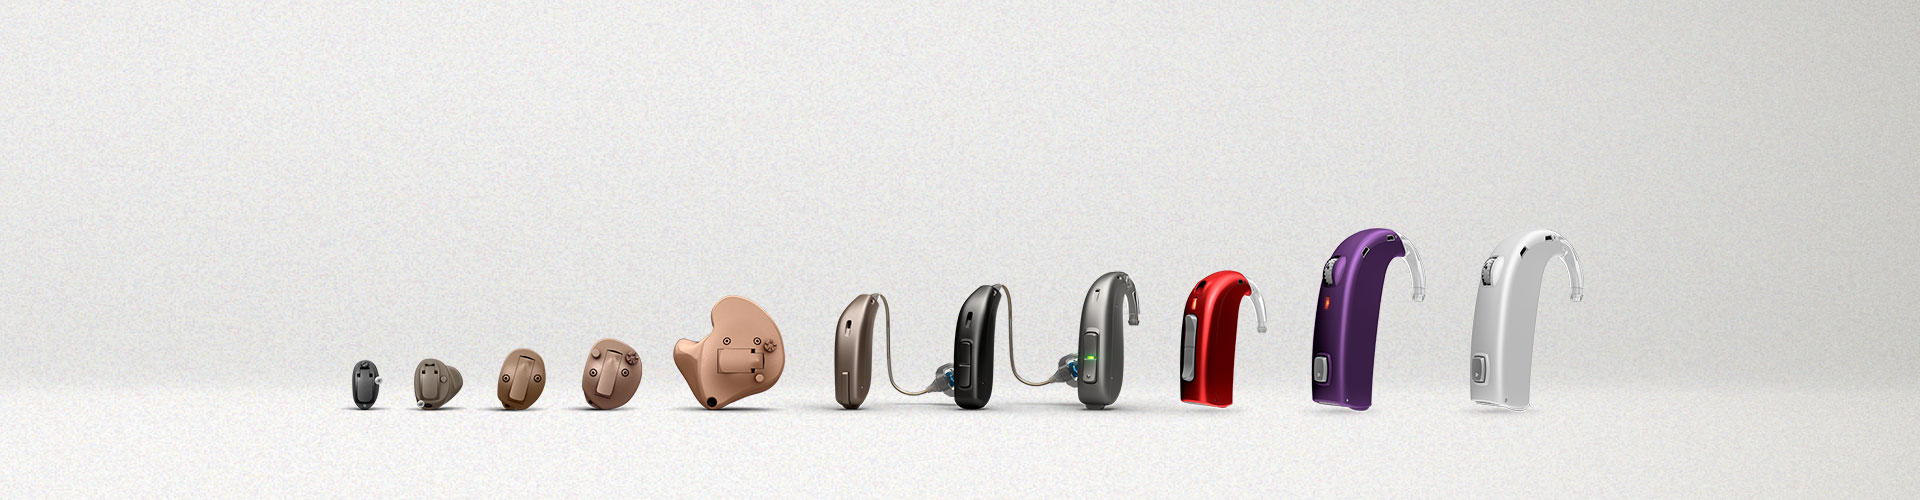 farandole de produits appareils auditifs Oticon